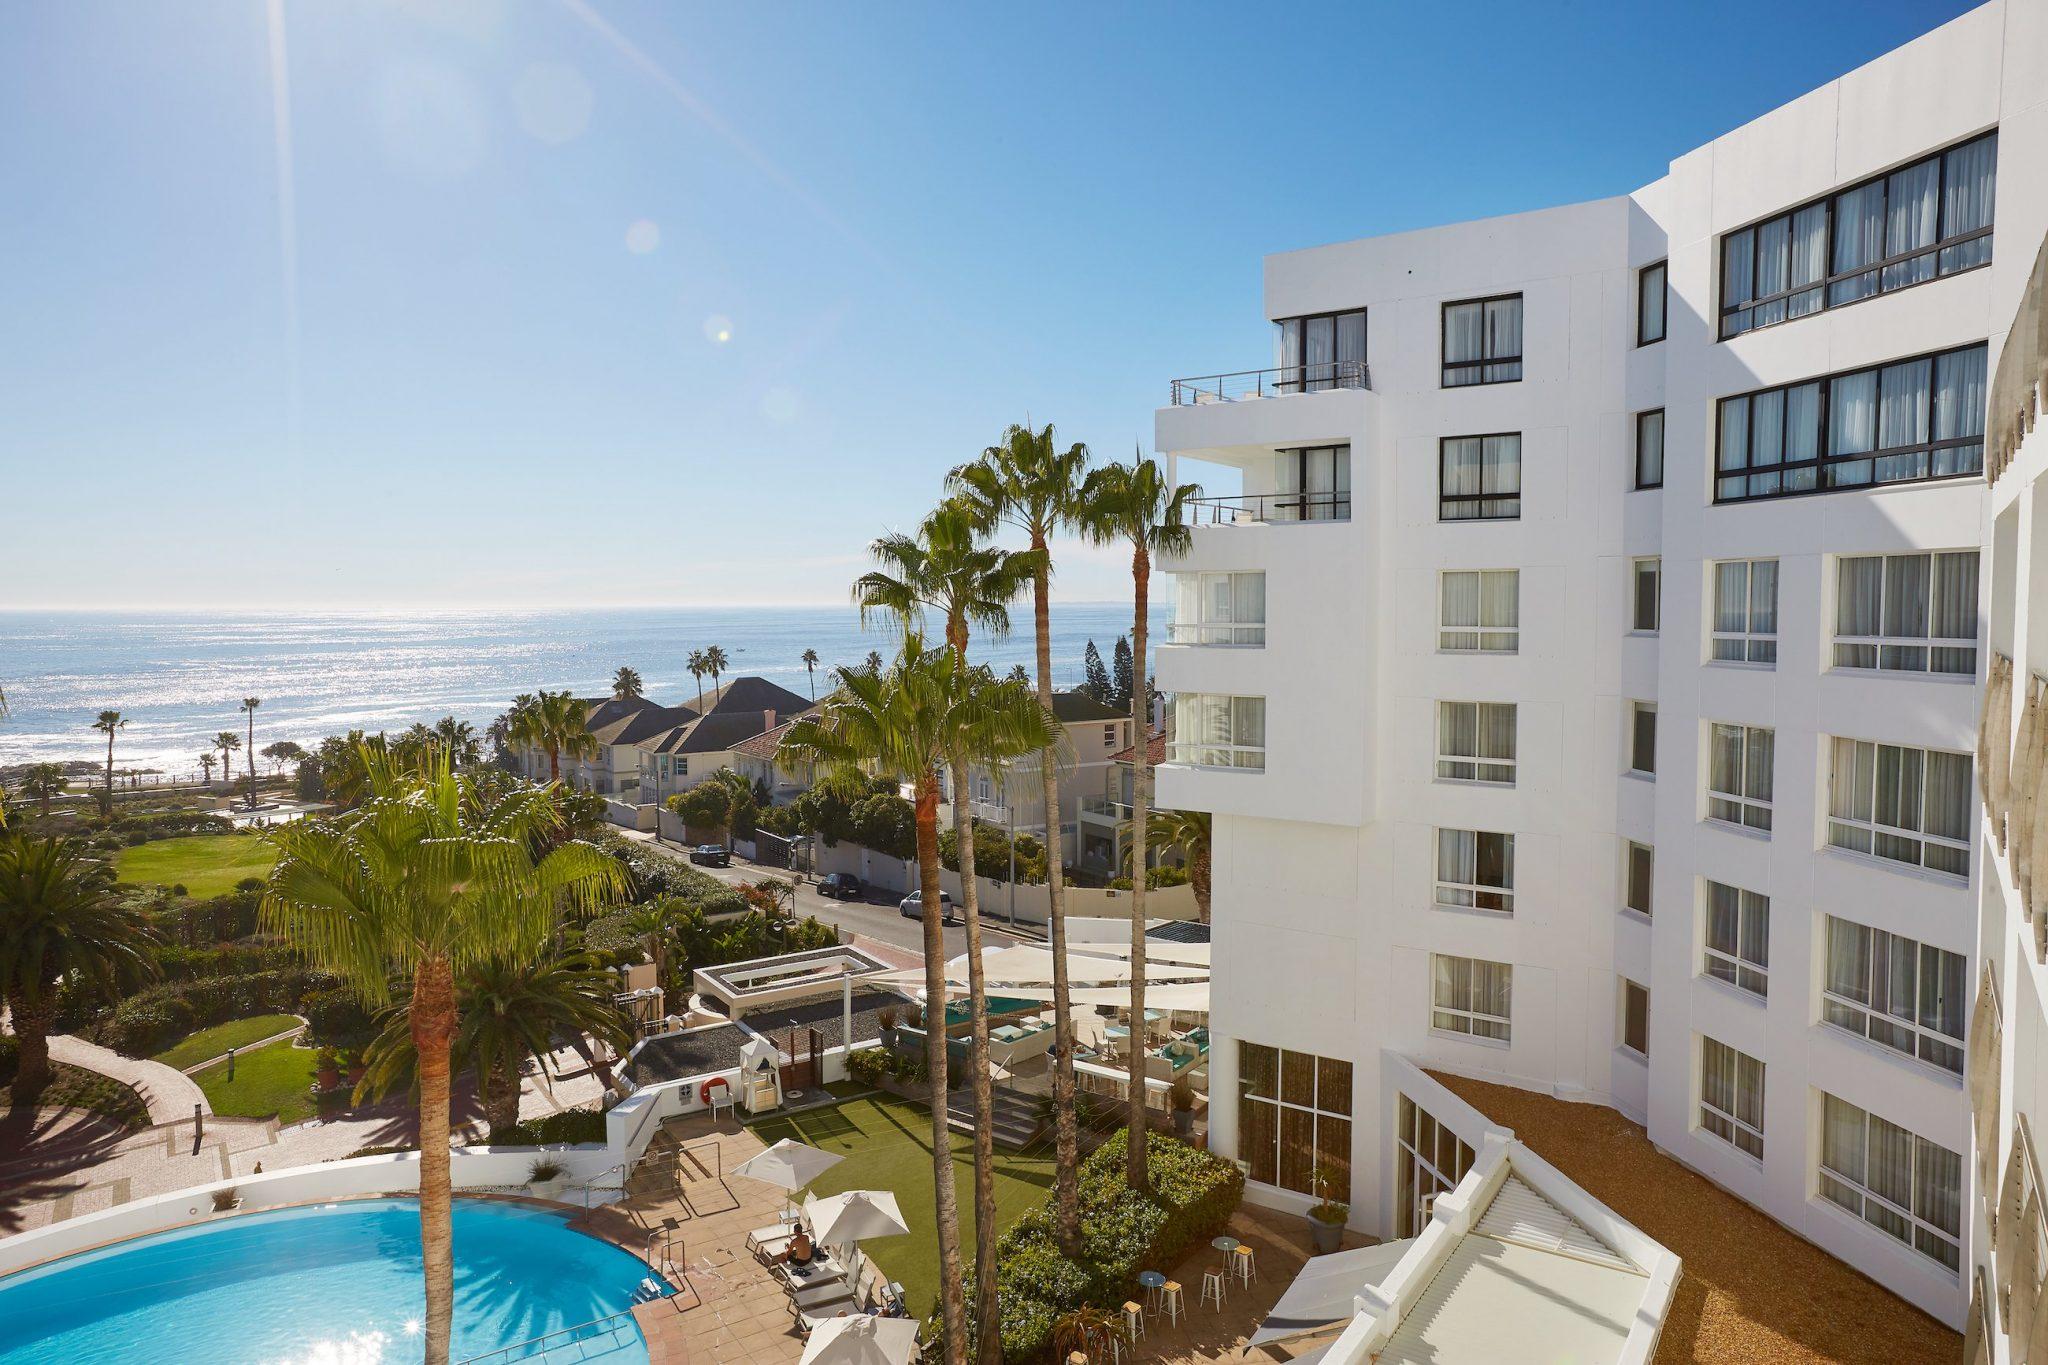 Atlantic View President Hotel Sonia Cabano blog eatdrinkcapetown